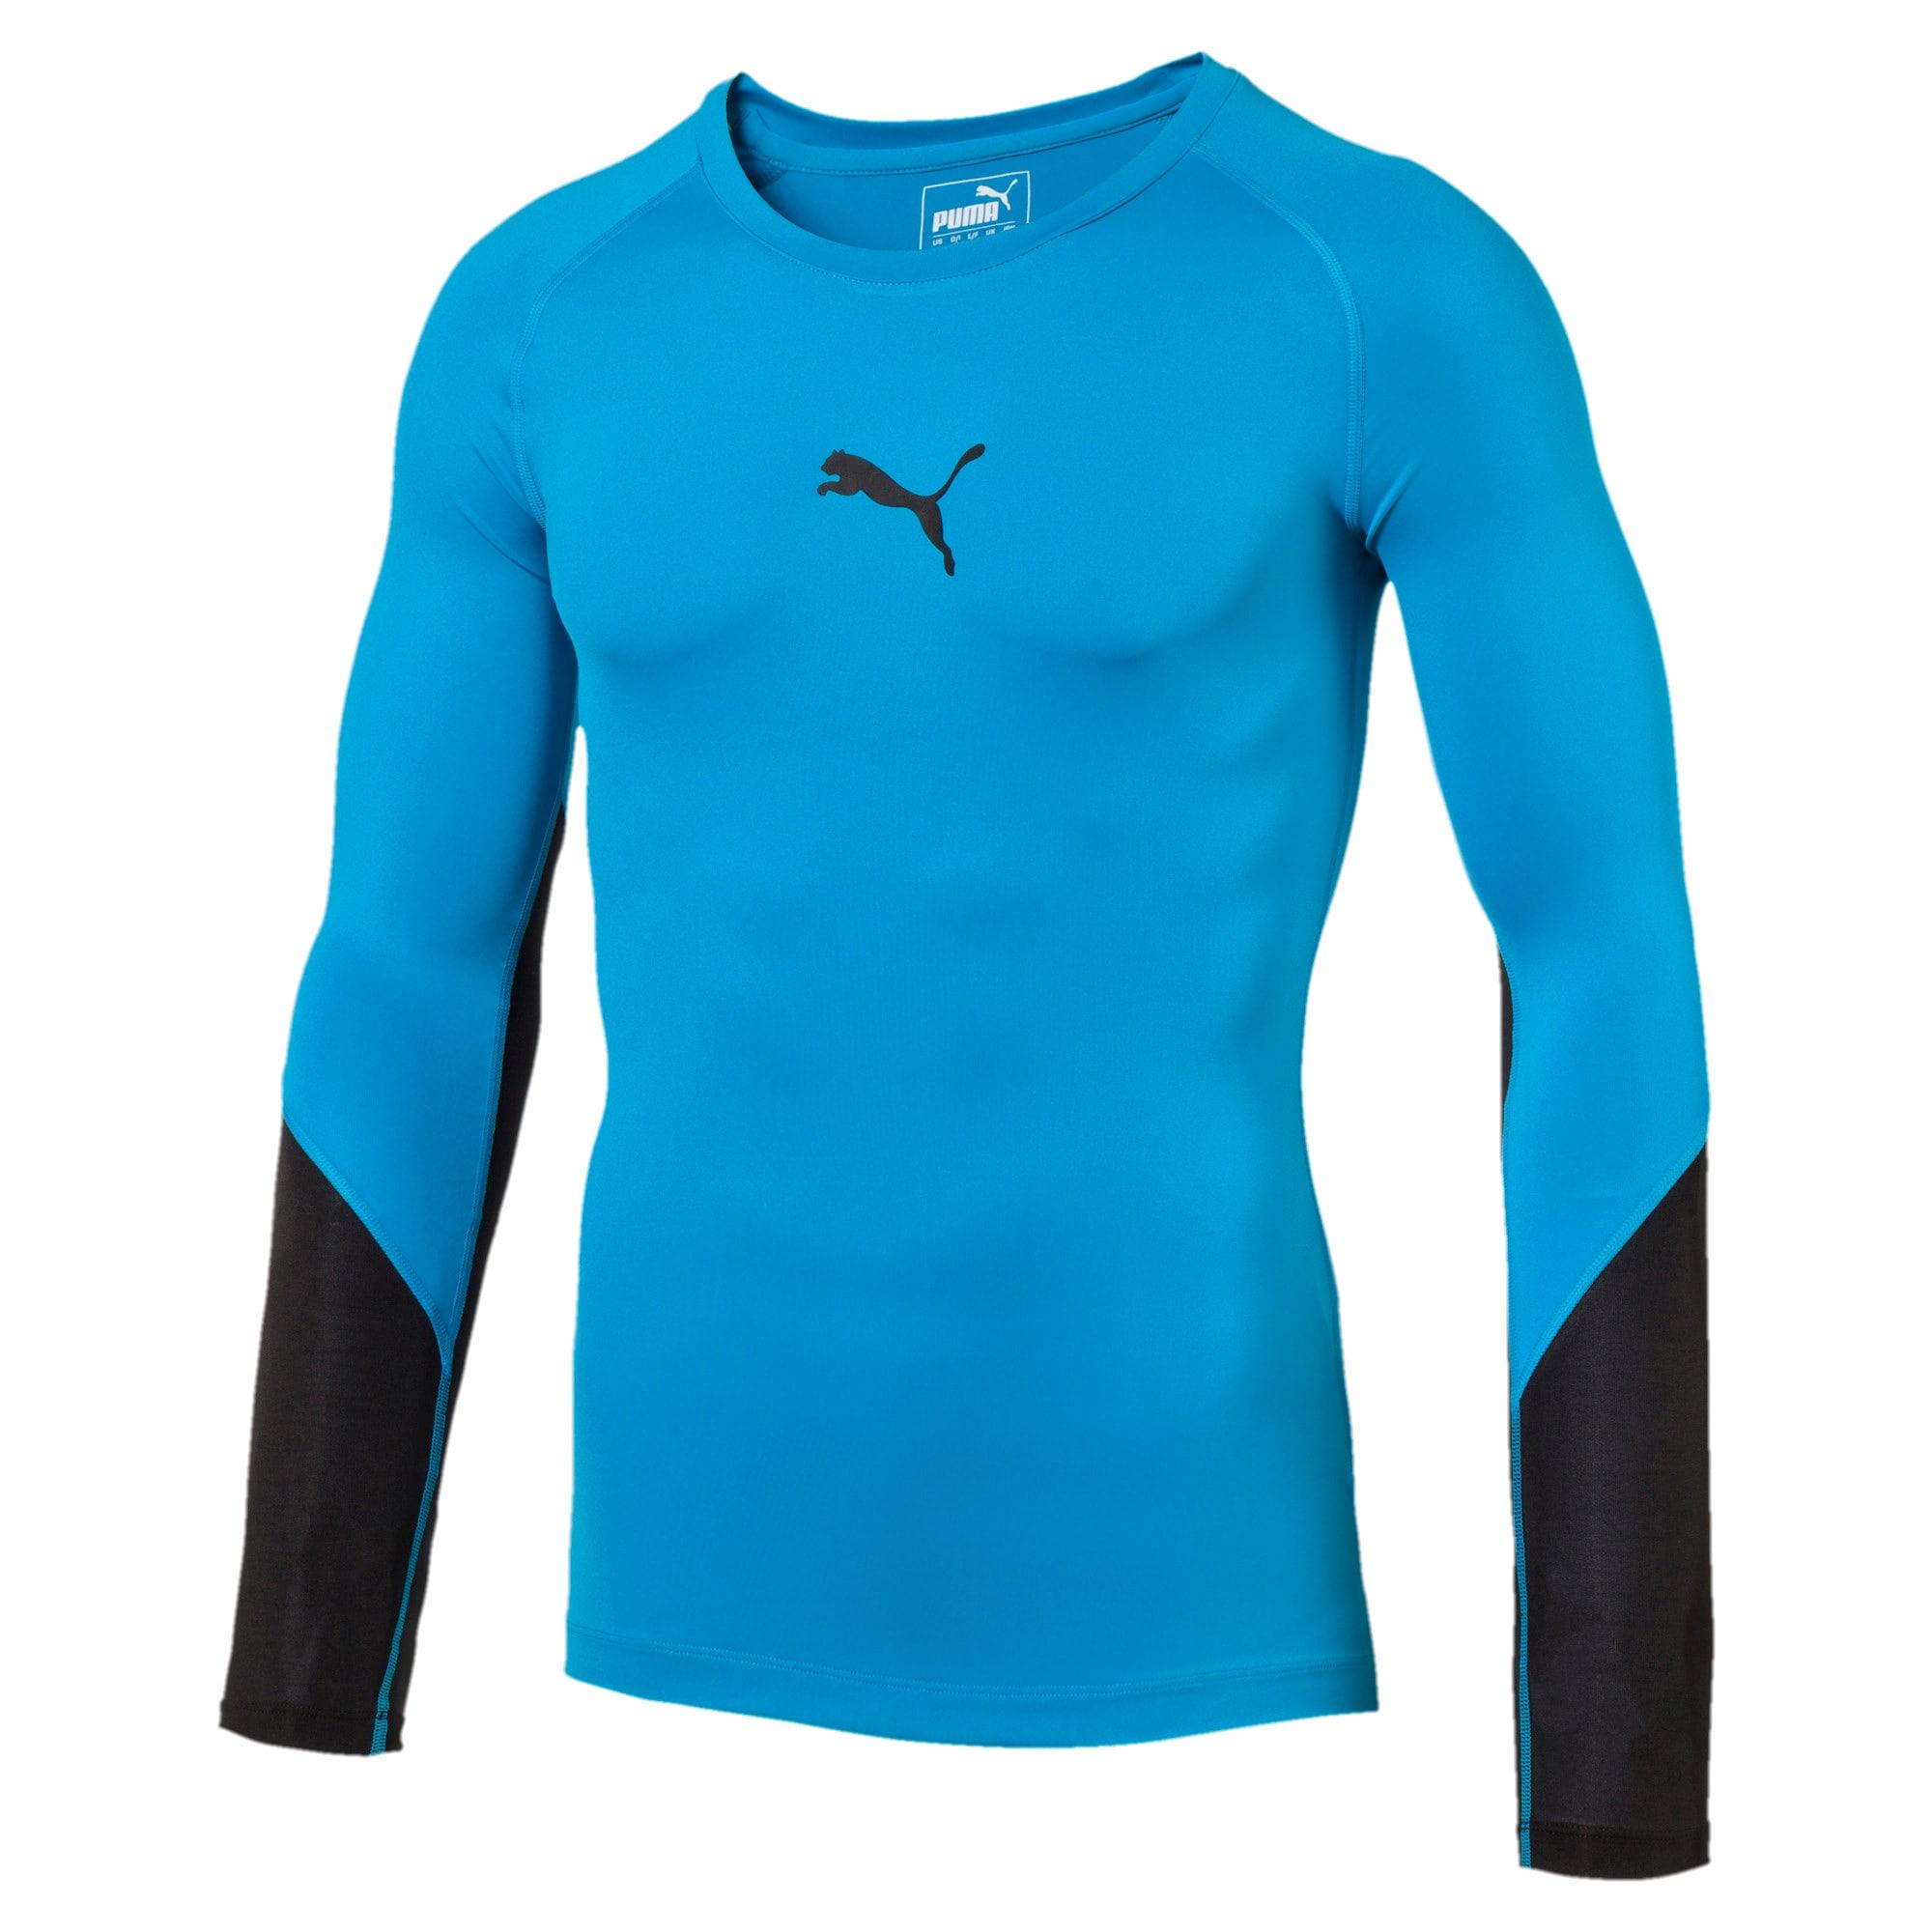 Thumbnail 3 of Training Lite Long Sleeve, BLUE DANUBE-Puma Black, medium-IND